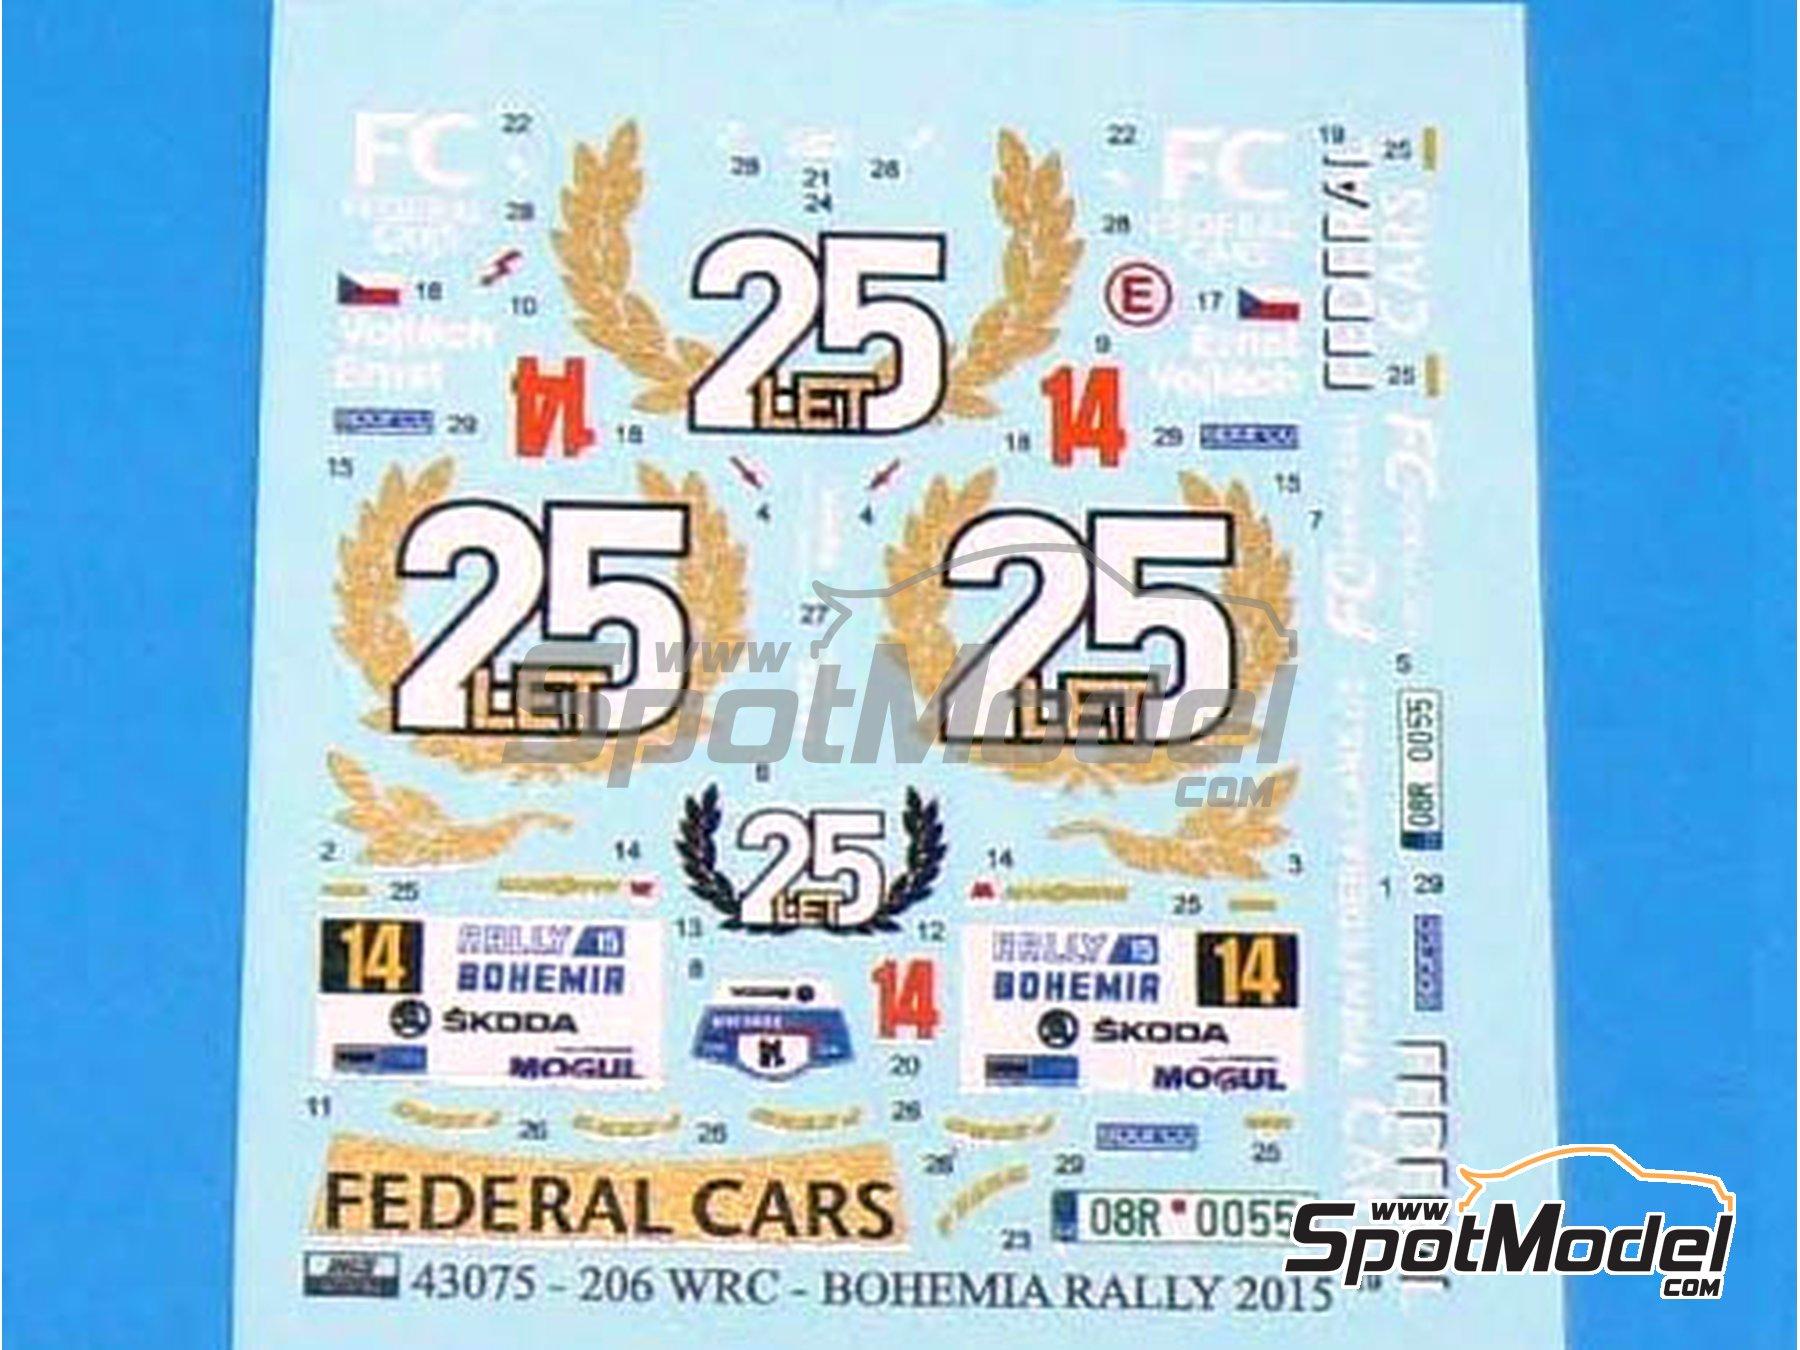 Image 1: Peugeot 206 WRC Federal Cars - Rally de Bohemia 2015 | Calcas de agua en escala1/43 fabricado por Reji Model (ref.REJI-43075)